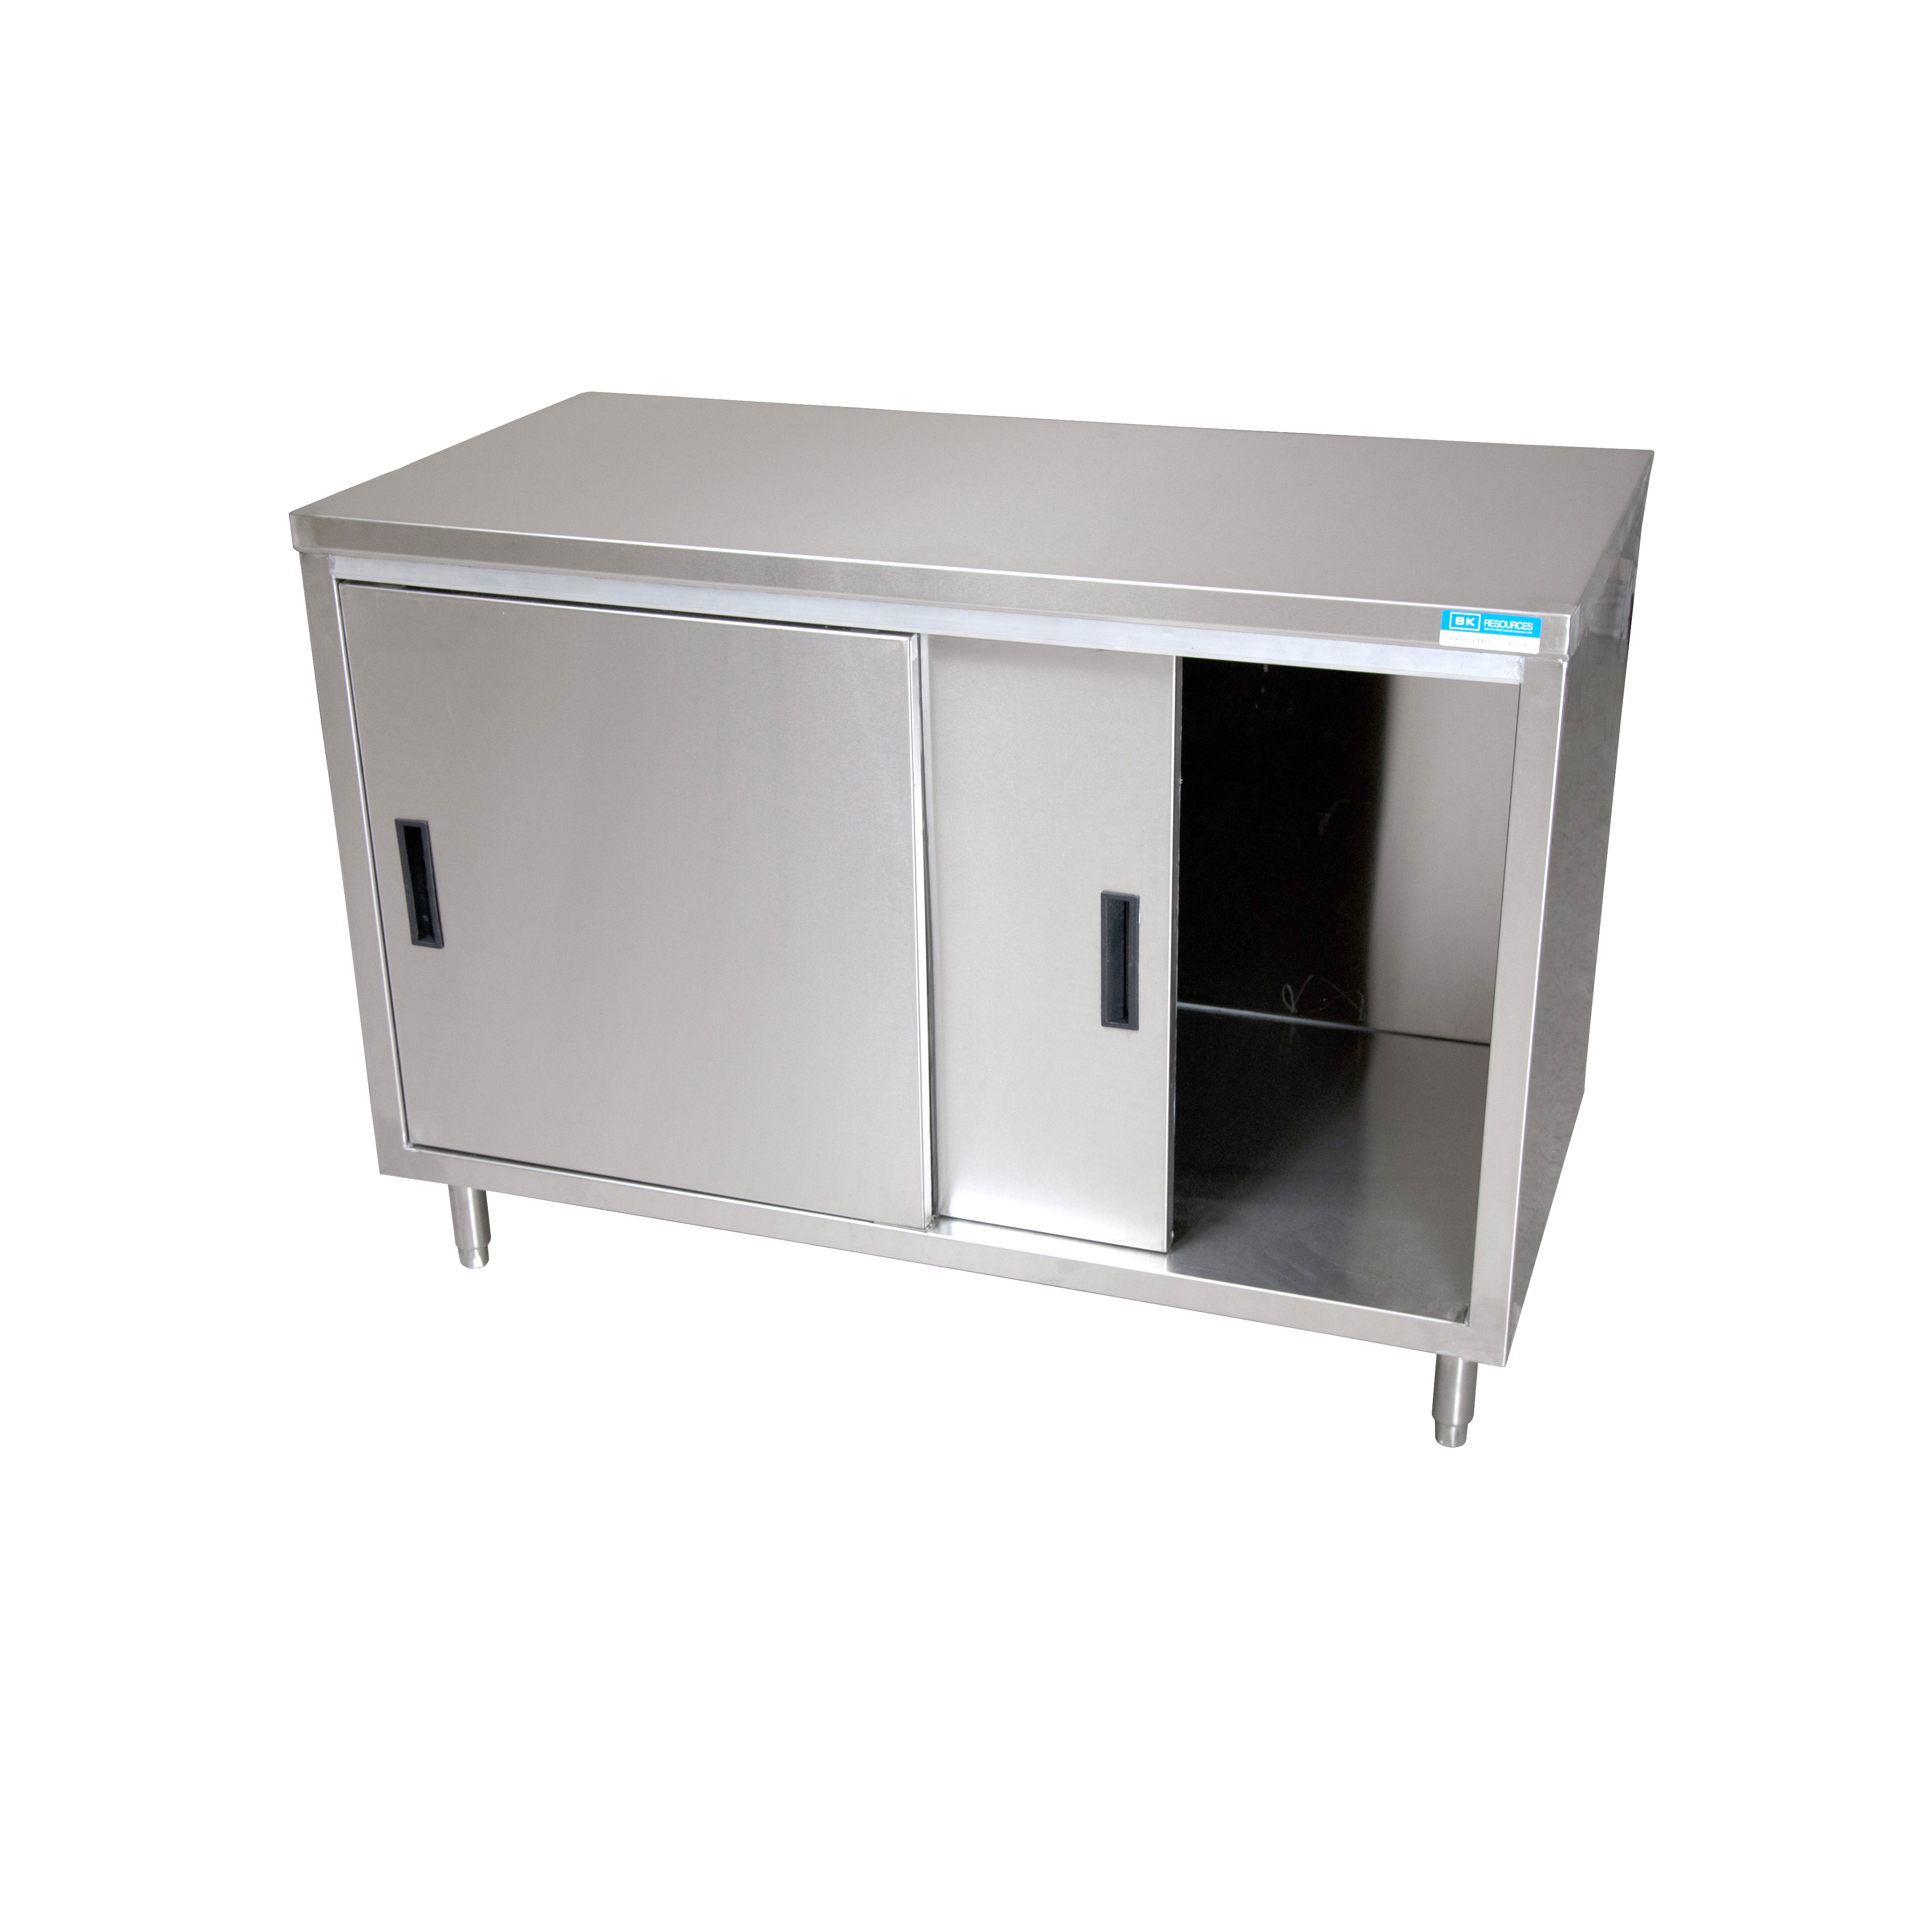 BK Resources BKDC-3672S work table, cabinet base sliding doors